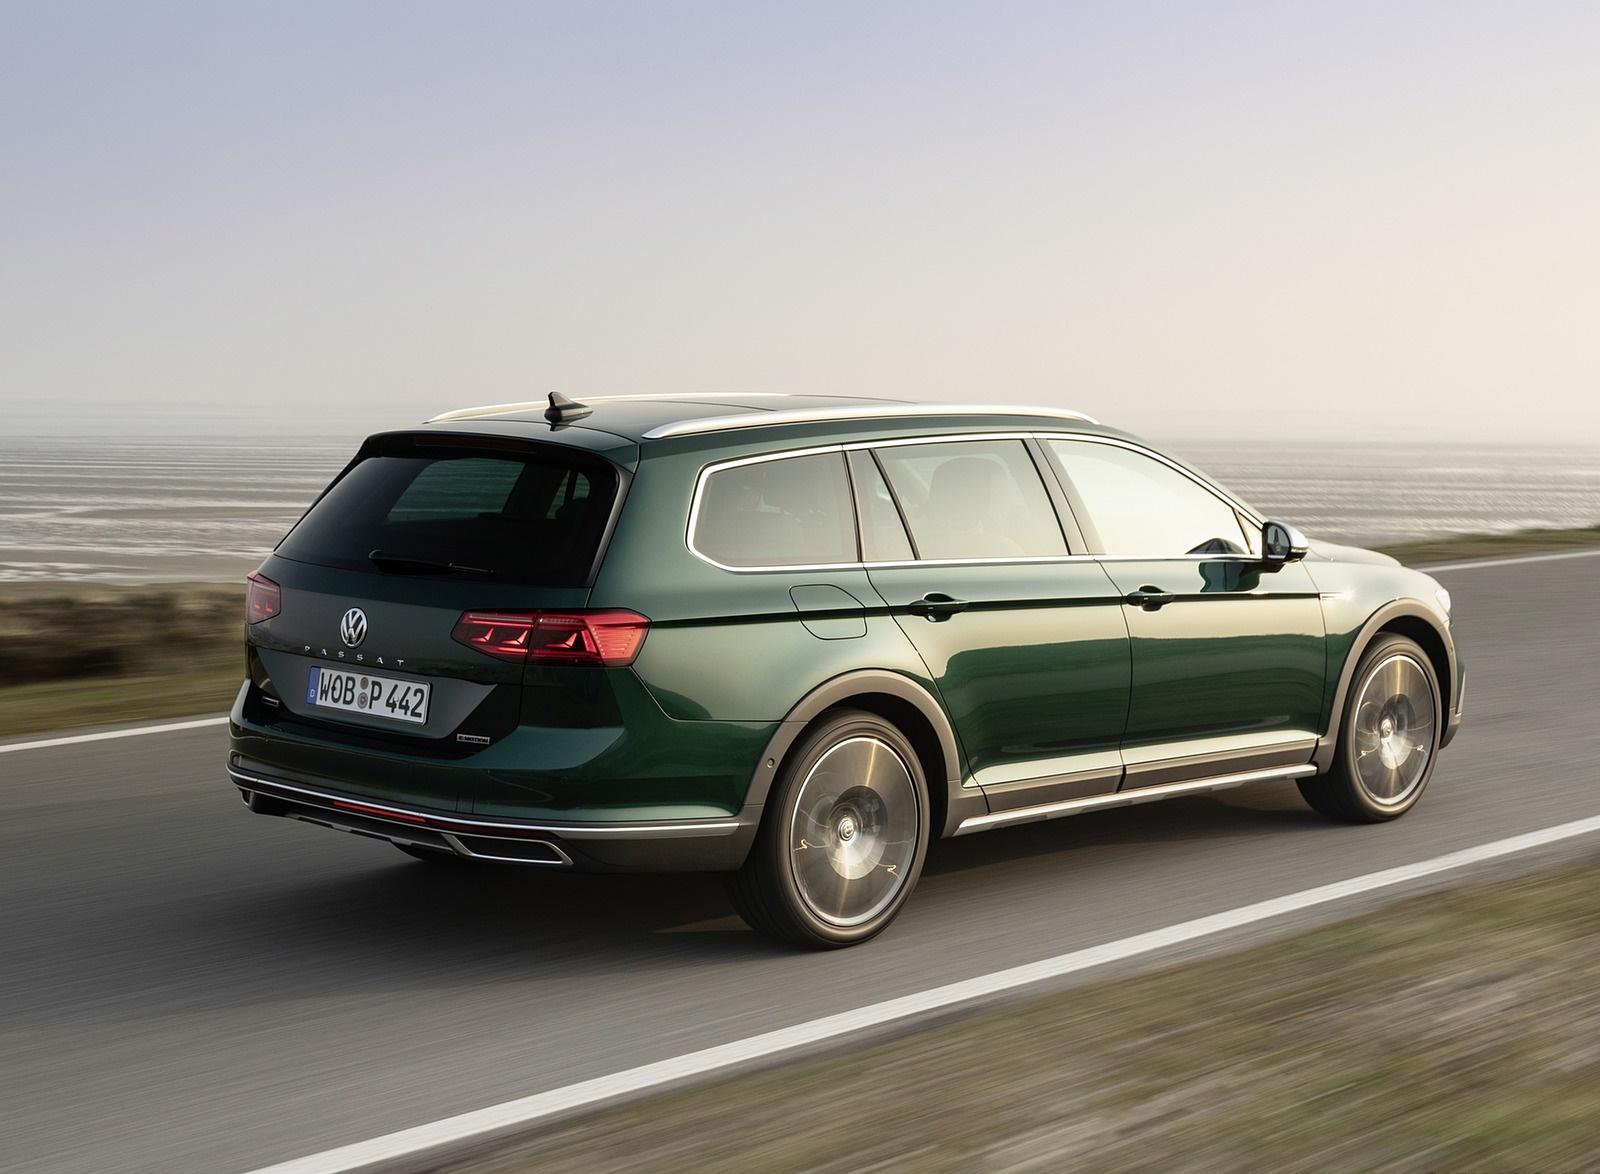 2020 Volkswagen Passat Alltrack (EU-Spec) Rear Three-Quarter Wallpapers (9)